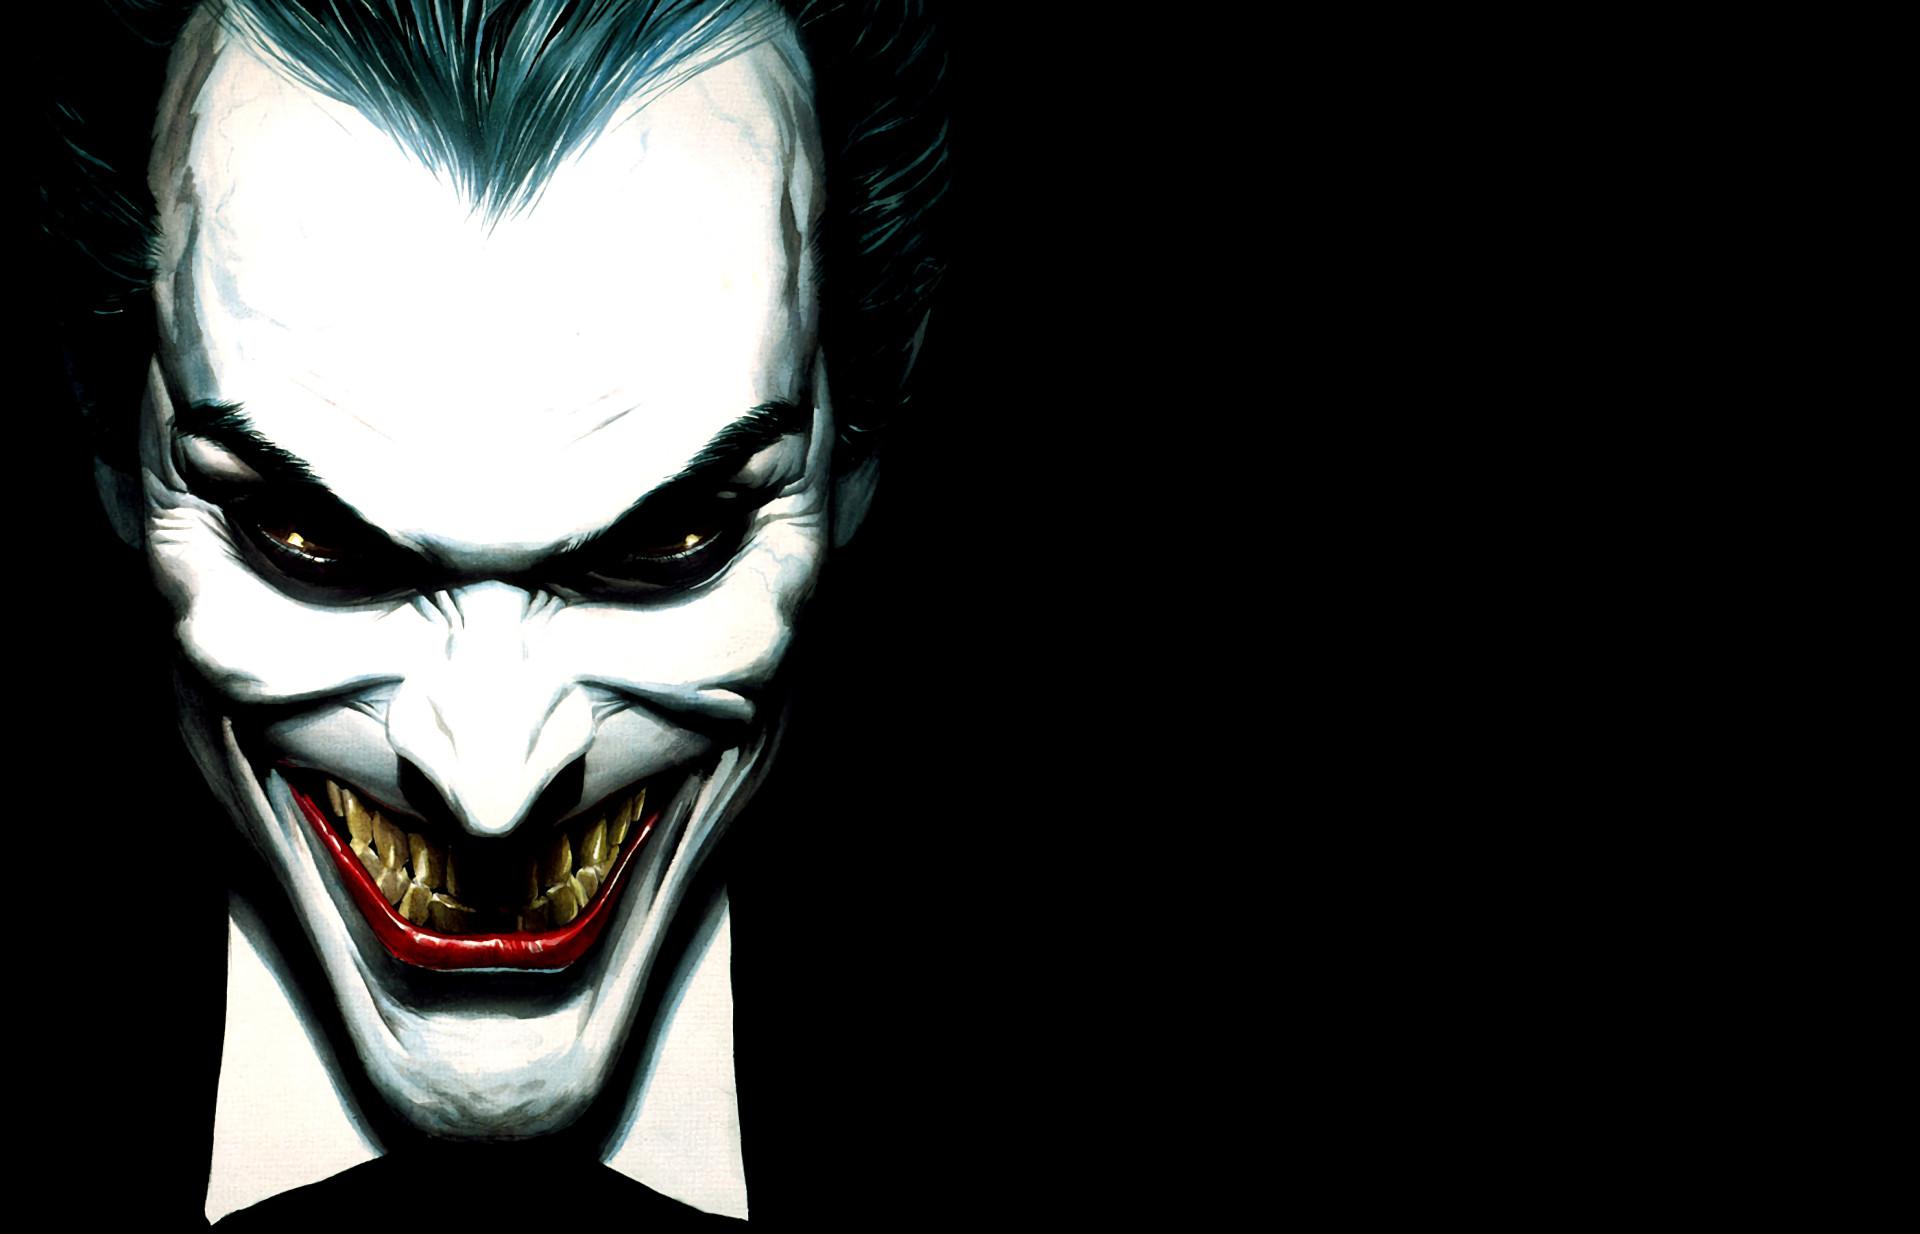 Joker Wallpapers for Widescreen Desktop PC Full HD ×